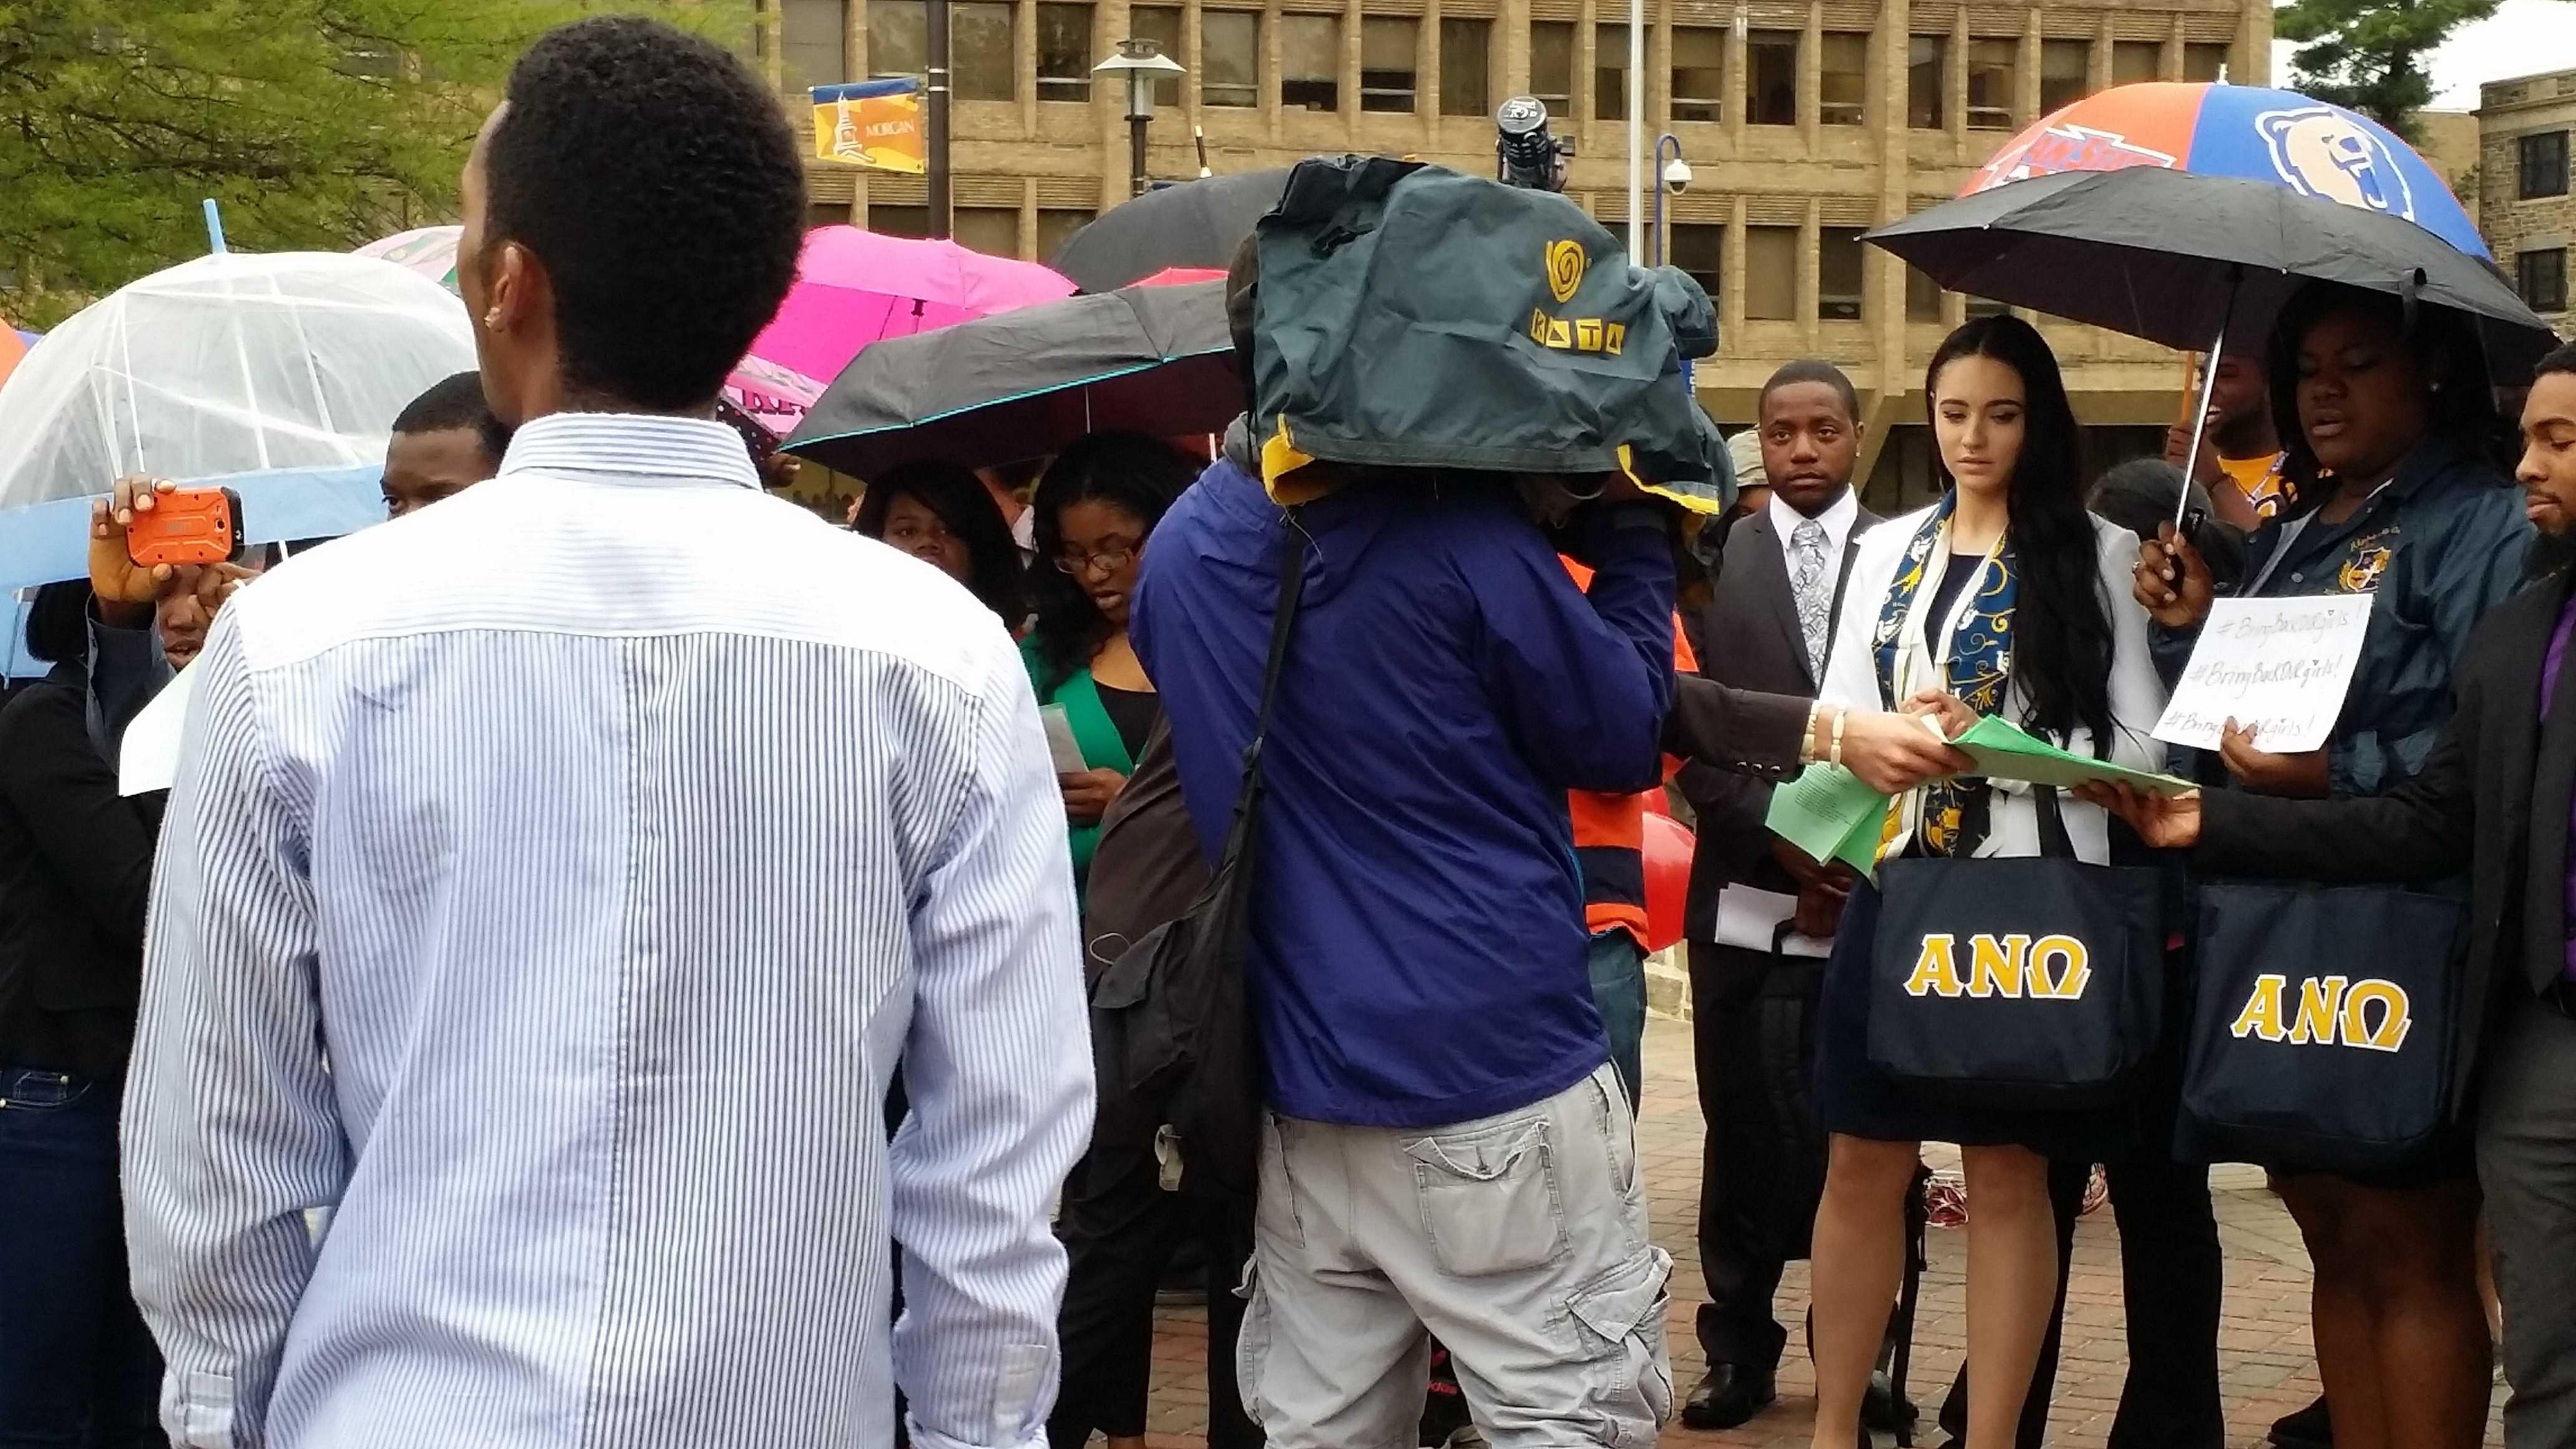 Morgan students protest Nigerian kidnappings.